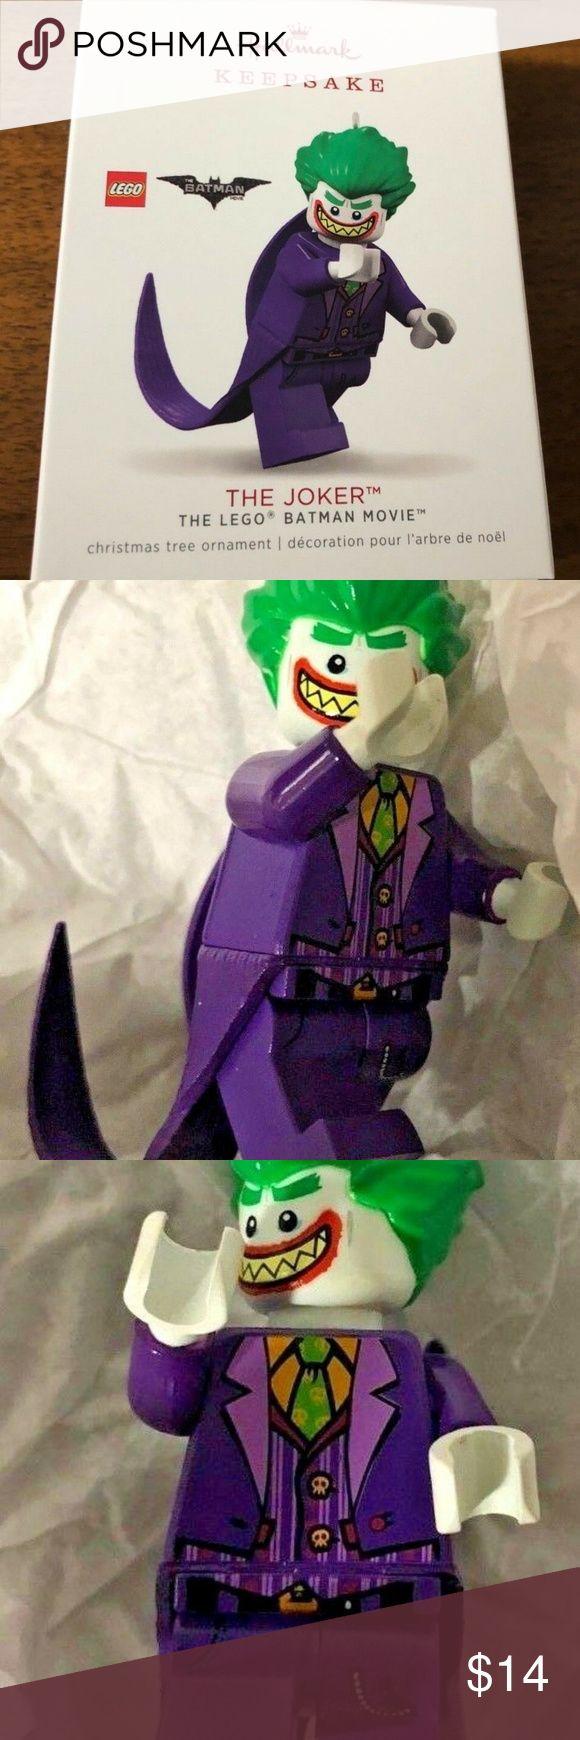 Hallmark The Lego Batman Movie The Joker Ornament Laugh ...